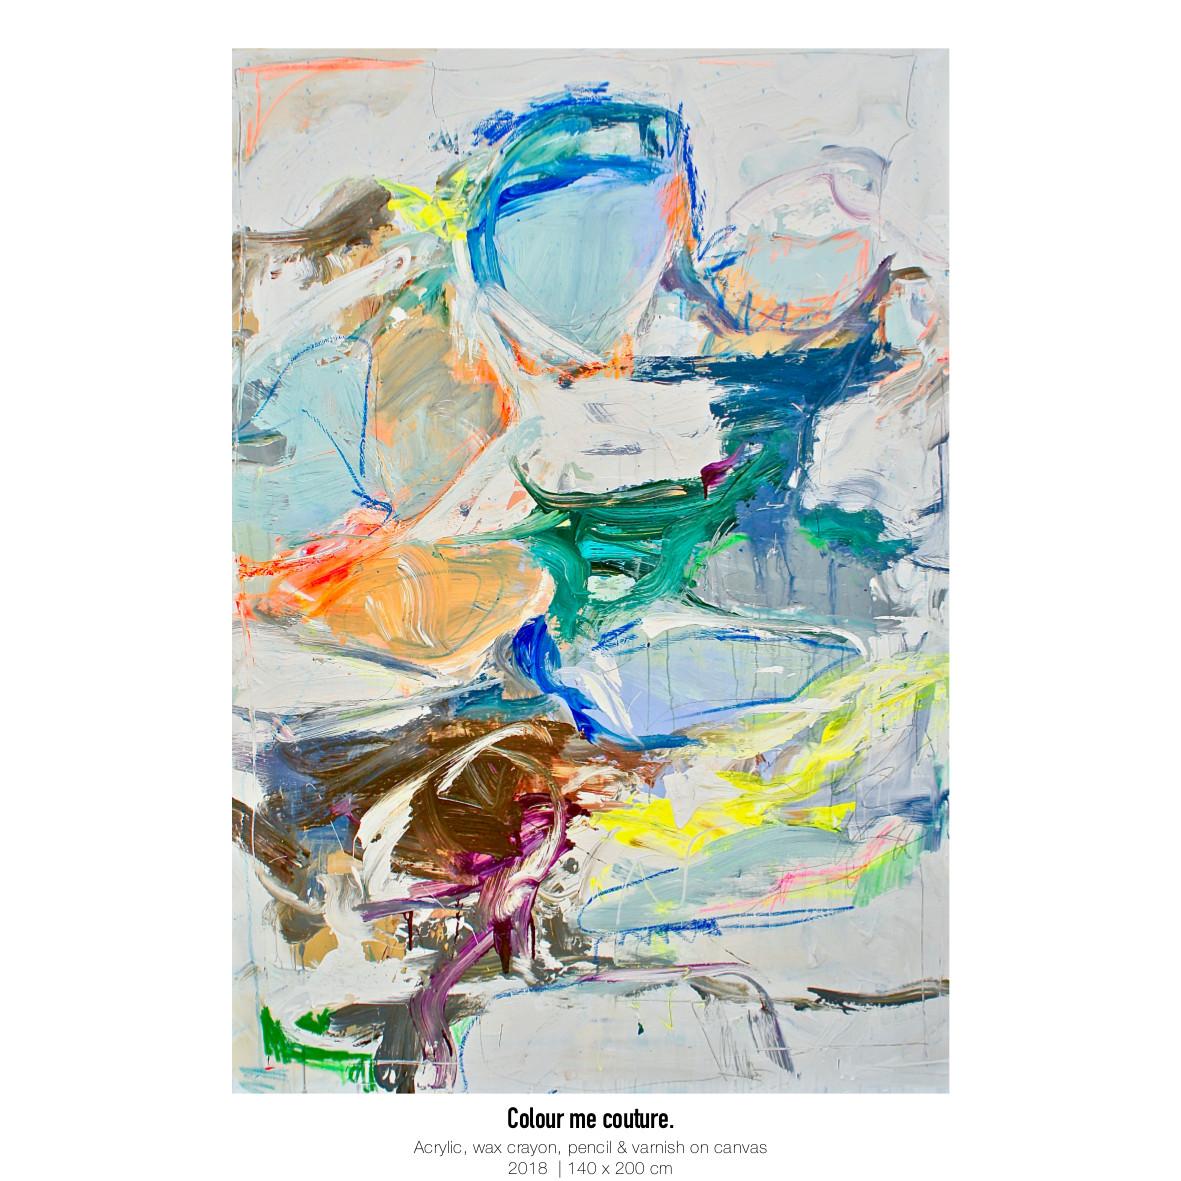 Theresa Kallrath Kallart_Colour me couture_Artist_Art_Contemporary Art